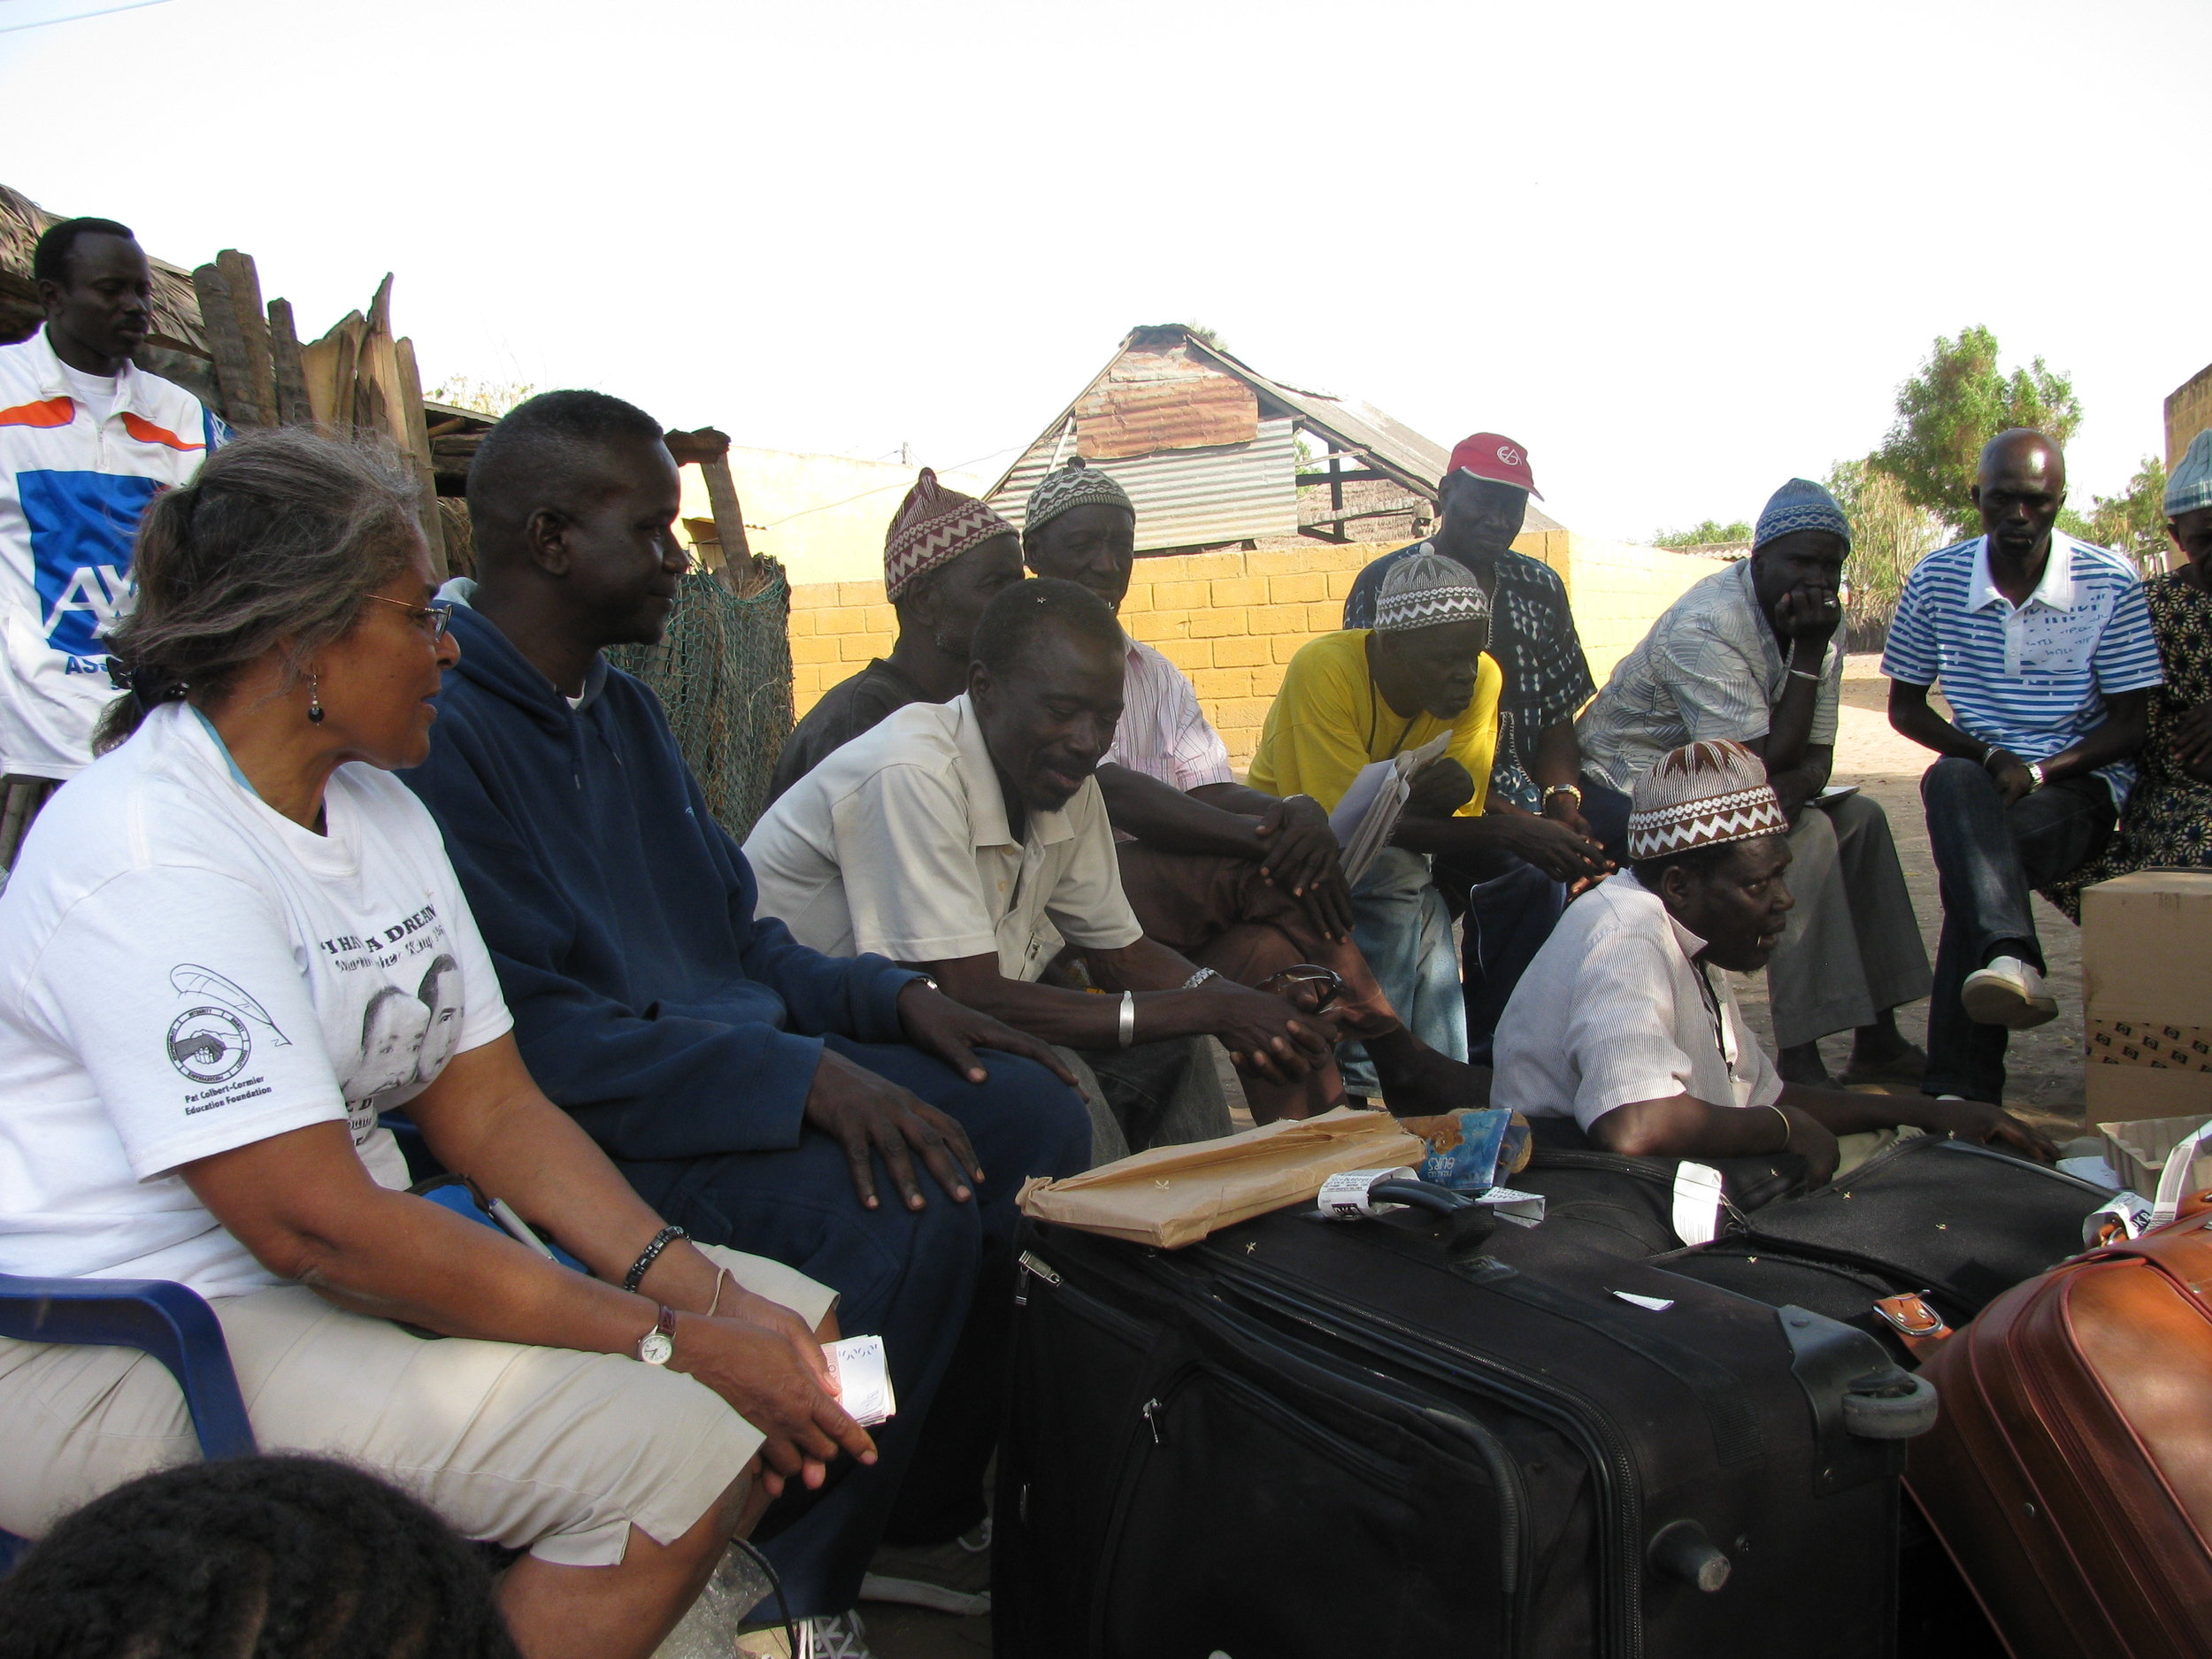 Africa--2009-Dijiloor, Dijidiack, Senegal, West Africa 148.jpg